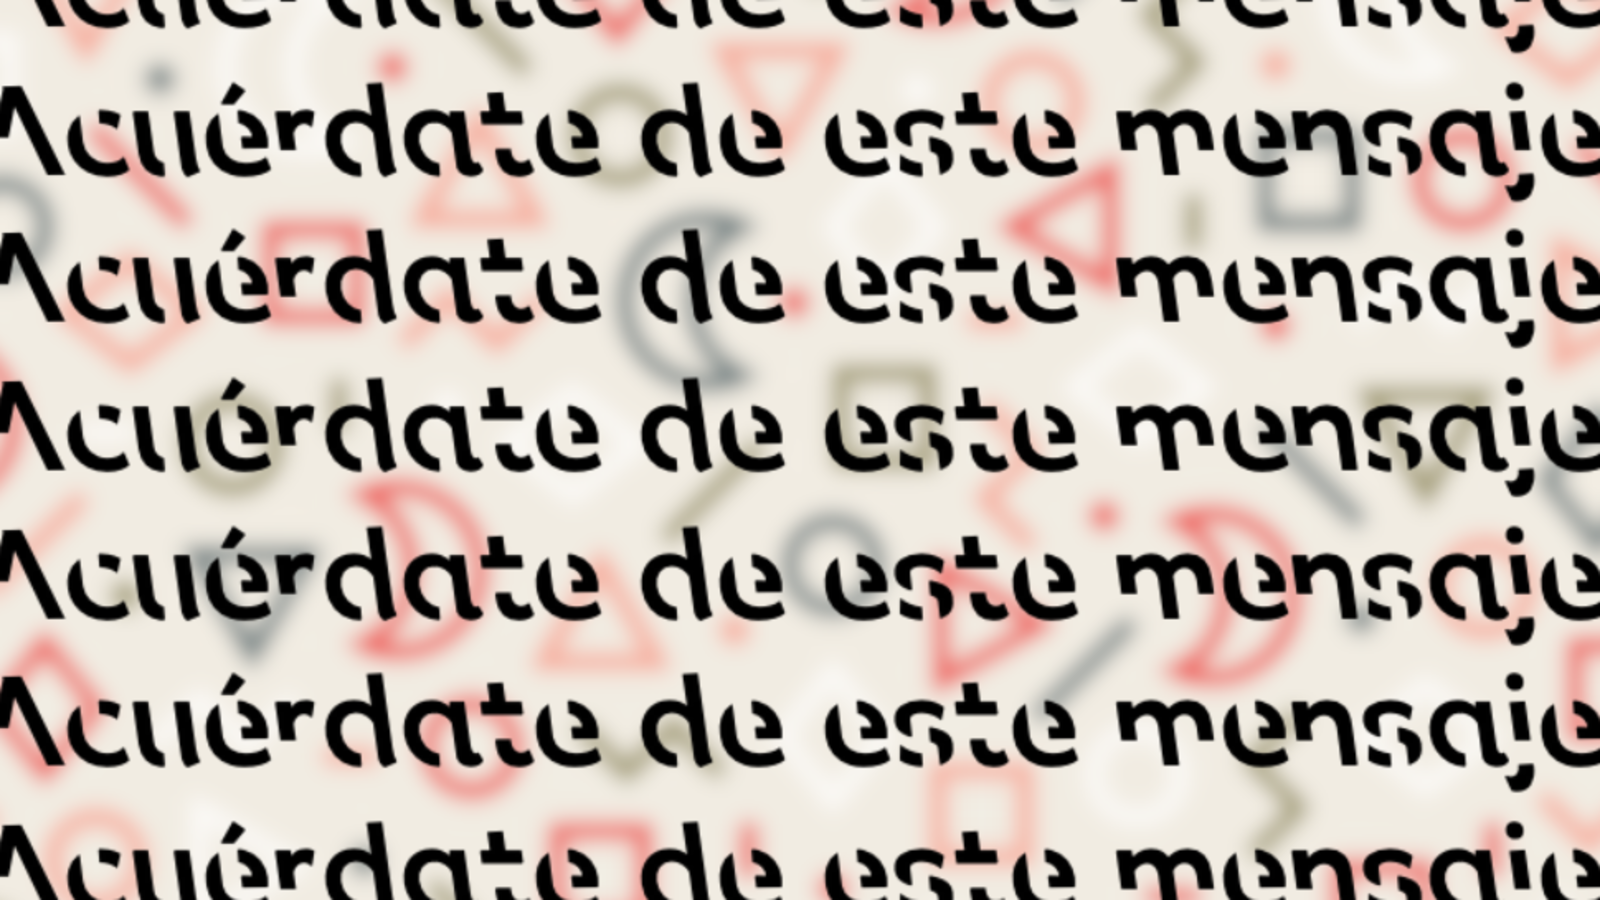 Científicos crean tipografía que ayuda a memorizar textos